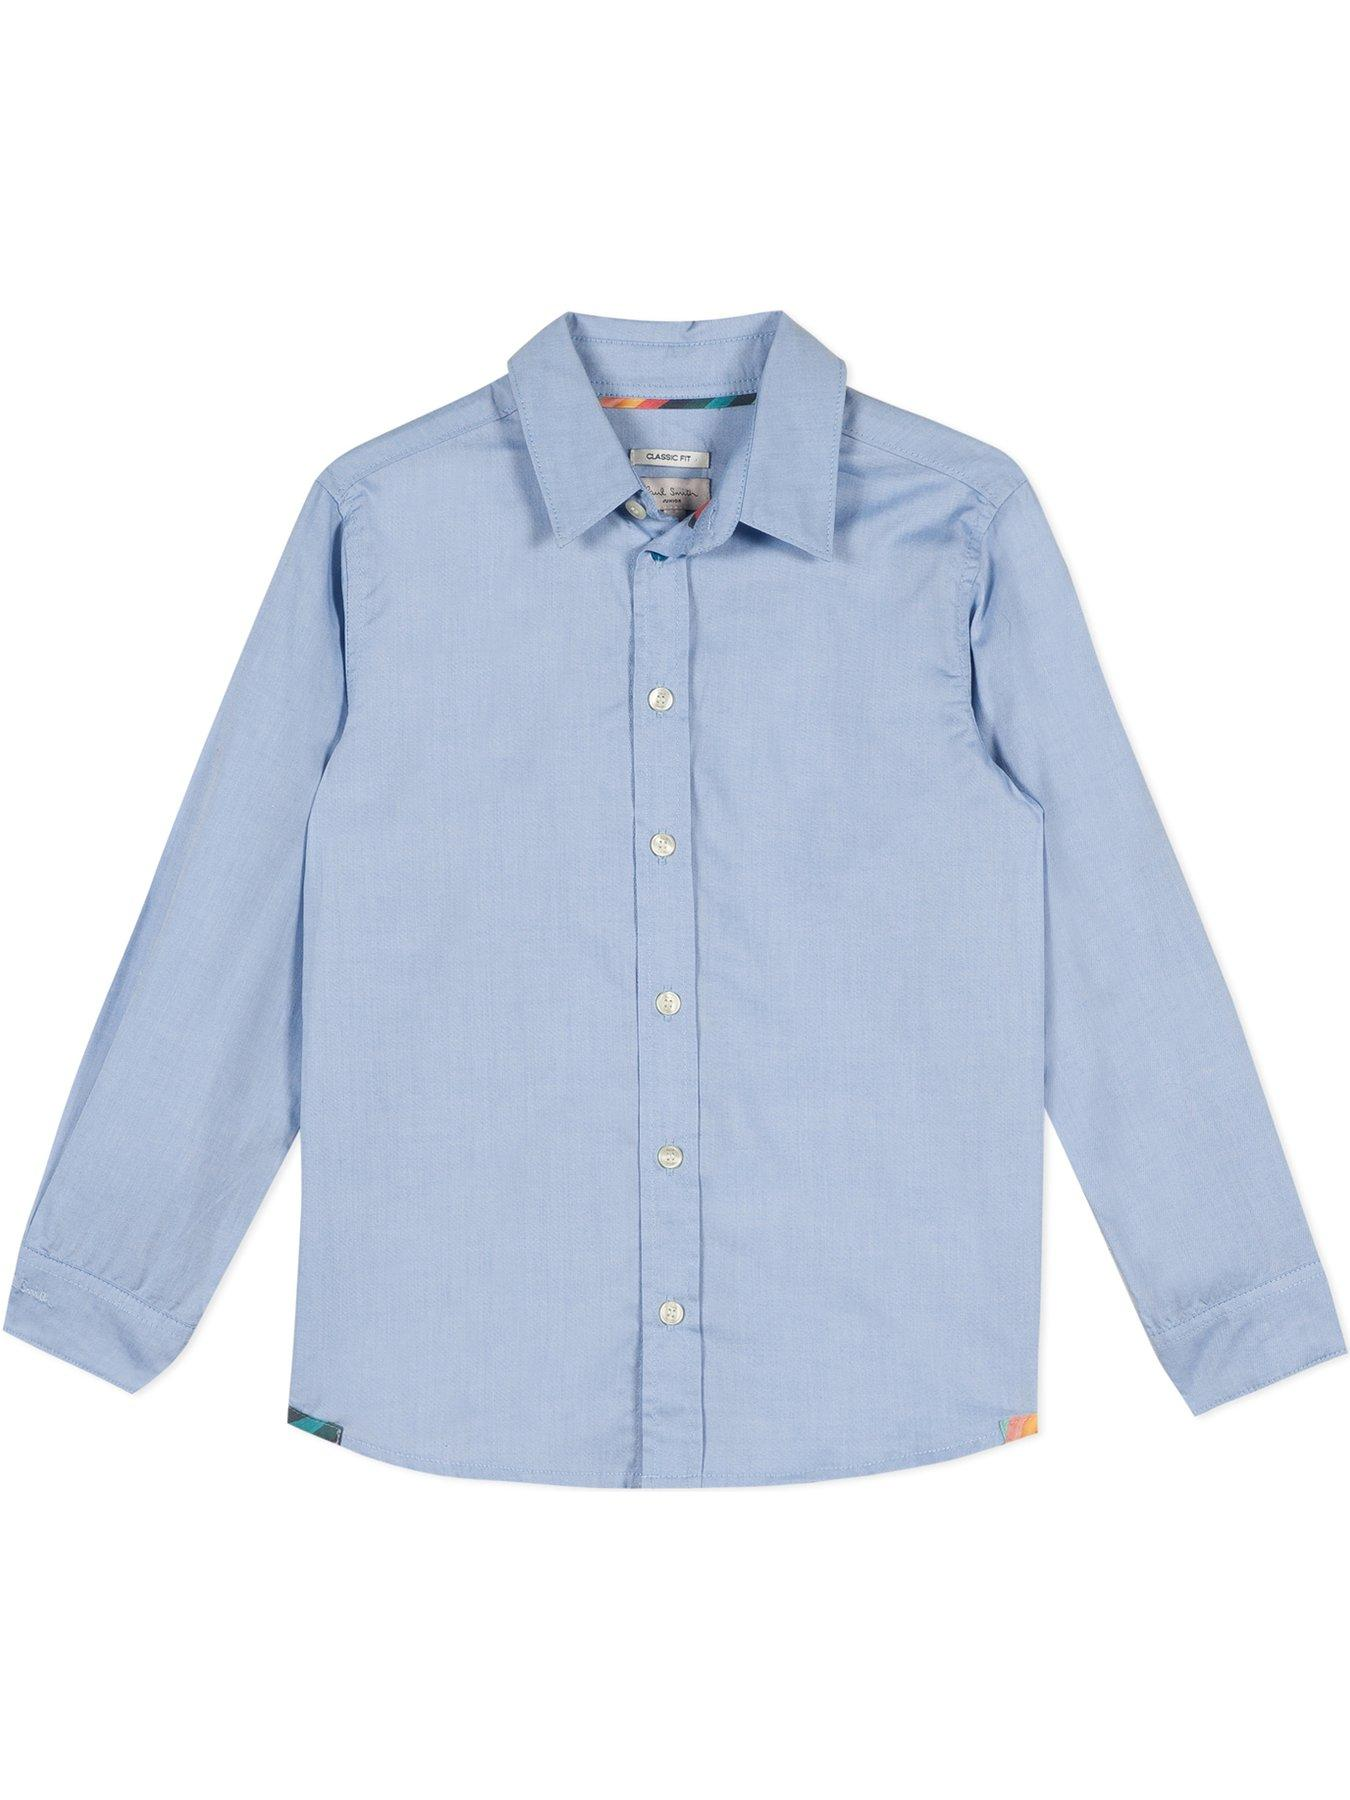 paul smith ps mens boys long sleeve shirt size s designer cuffs pink